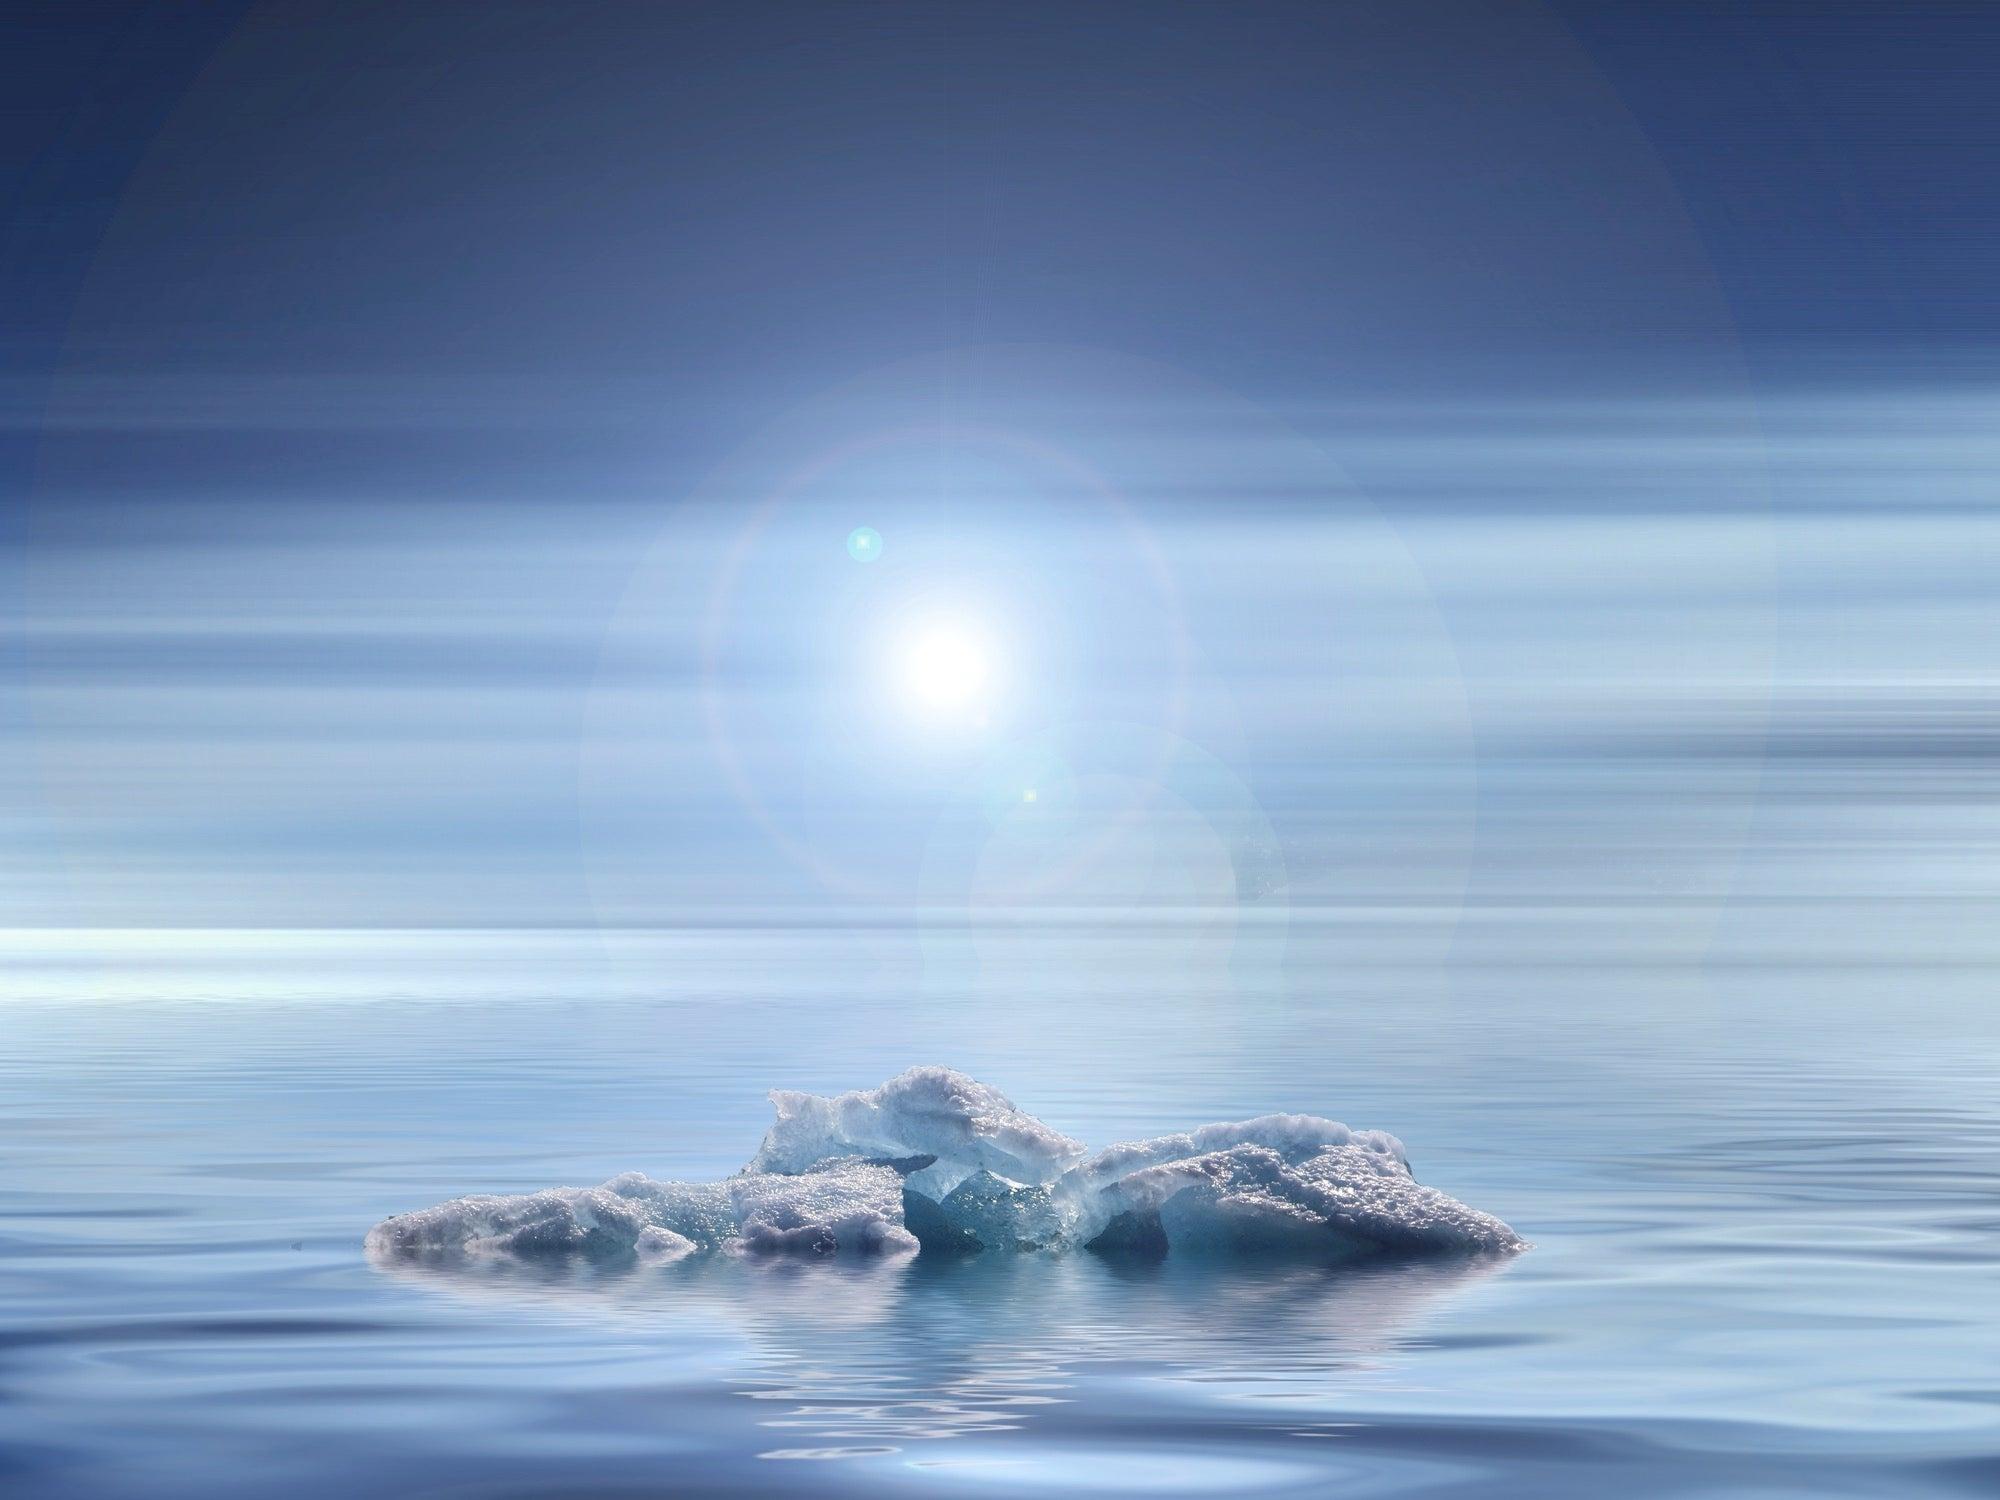 glacier in water